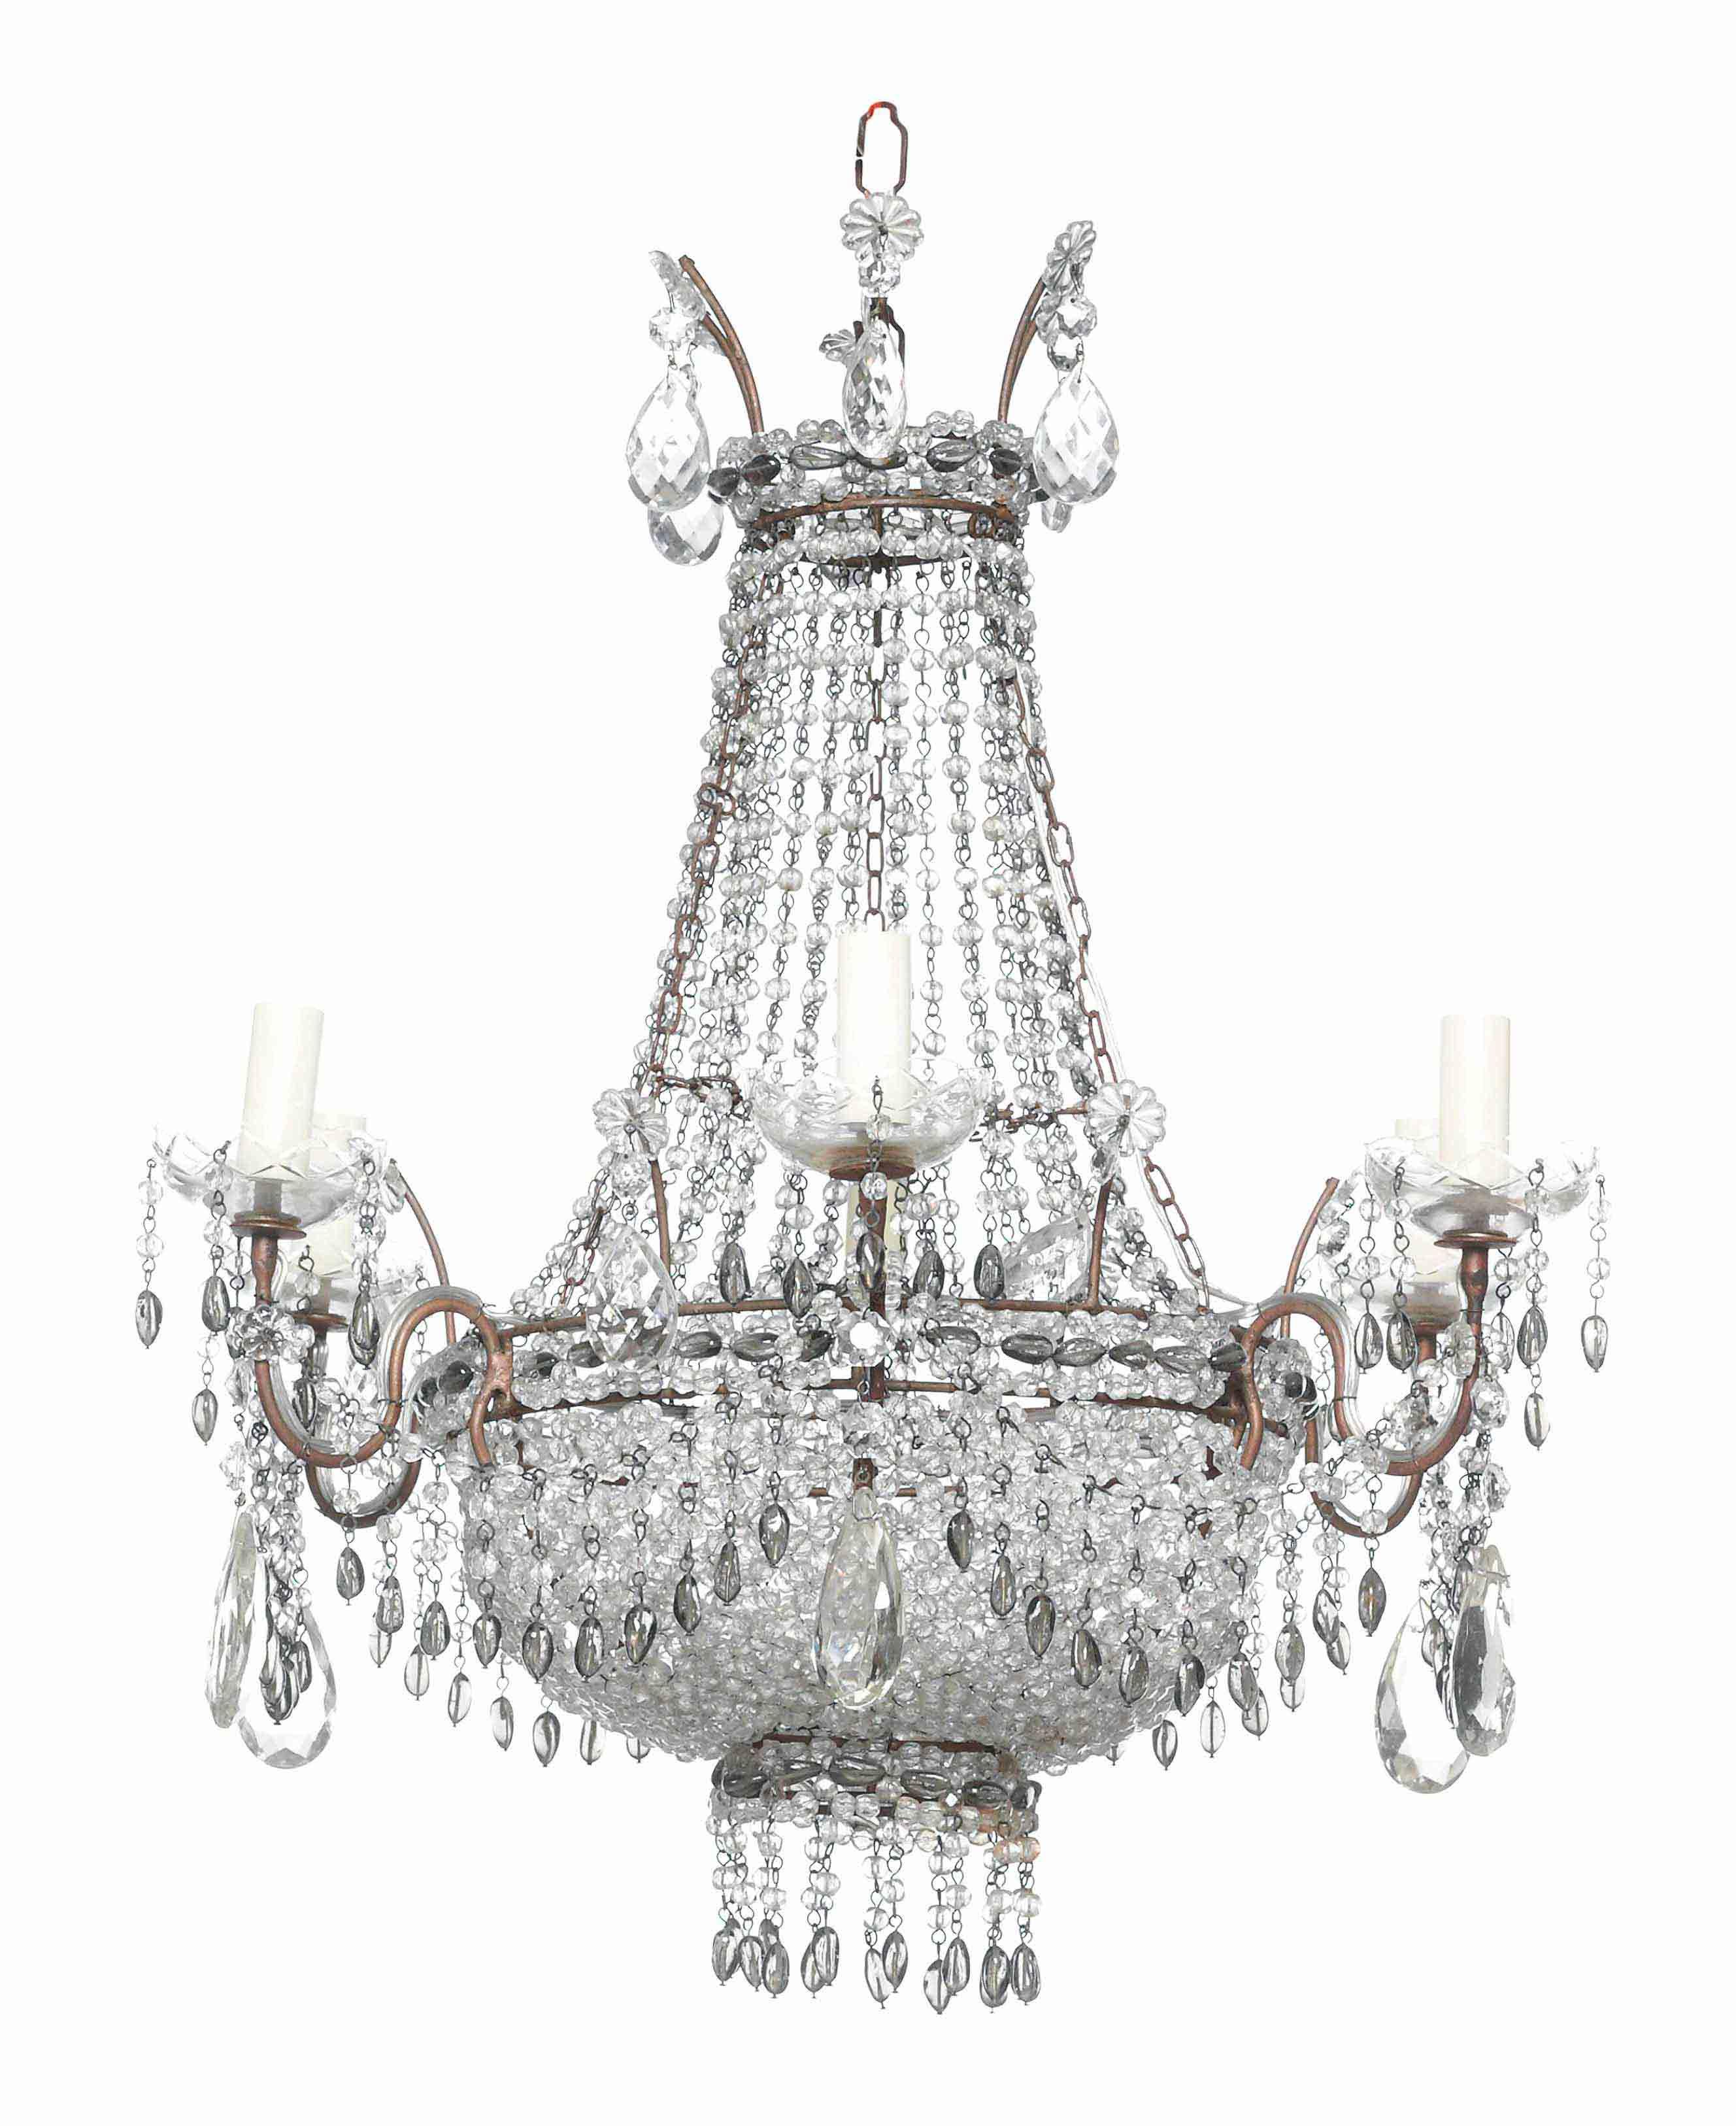 A VENETIAN BEADED-GLASS SIX-LIGHT CHANDELIER